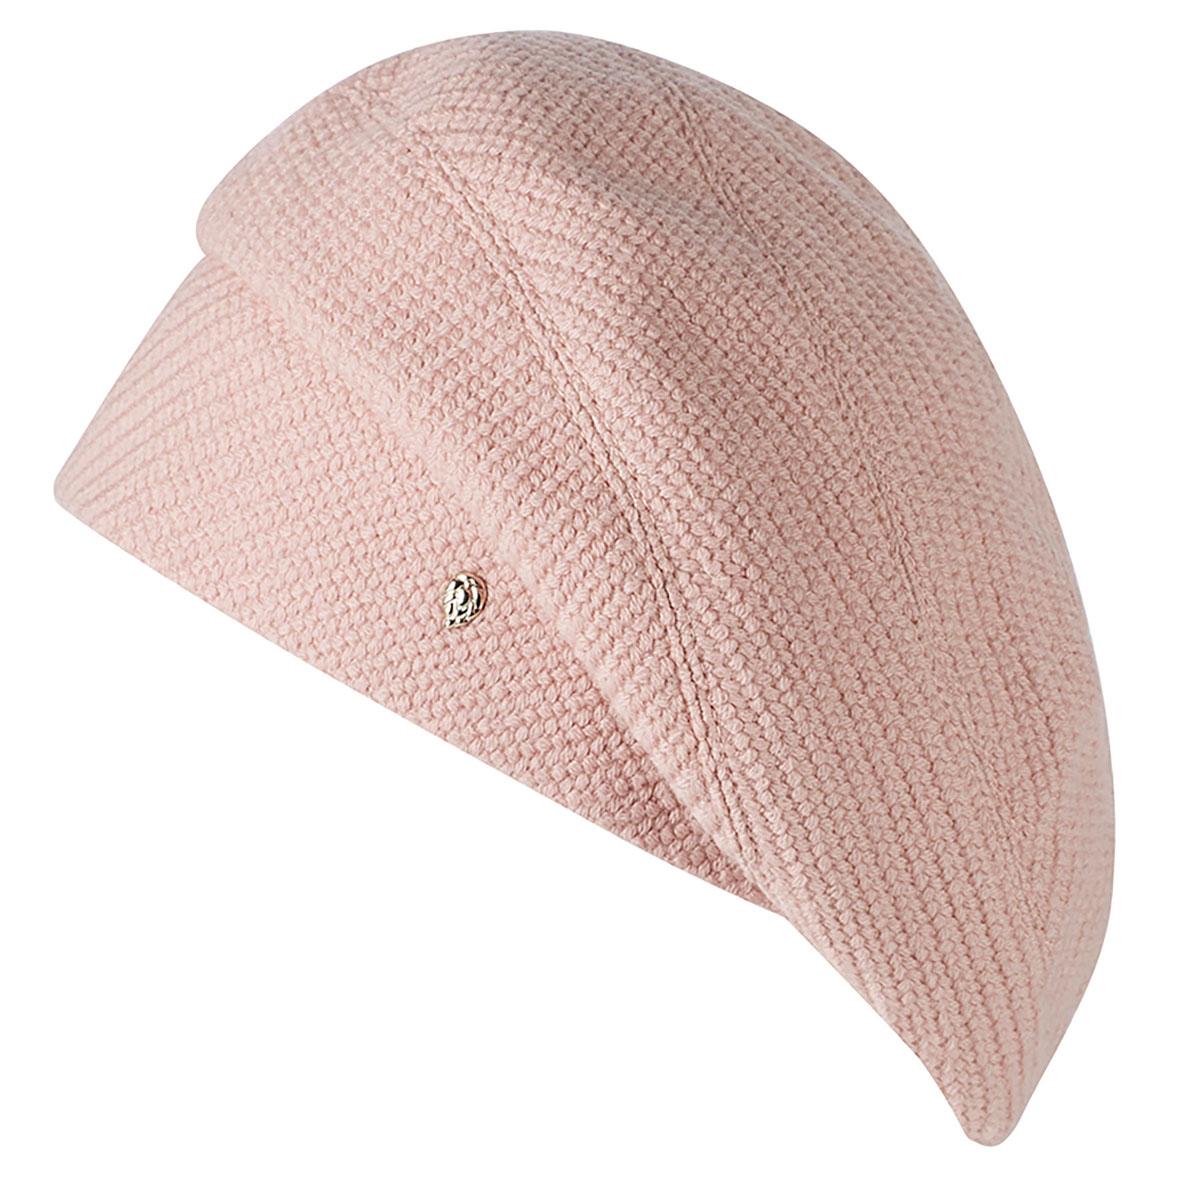 Helen Kaminski Ainsley Beret in Pink